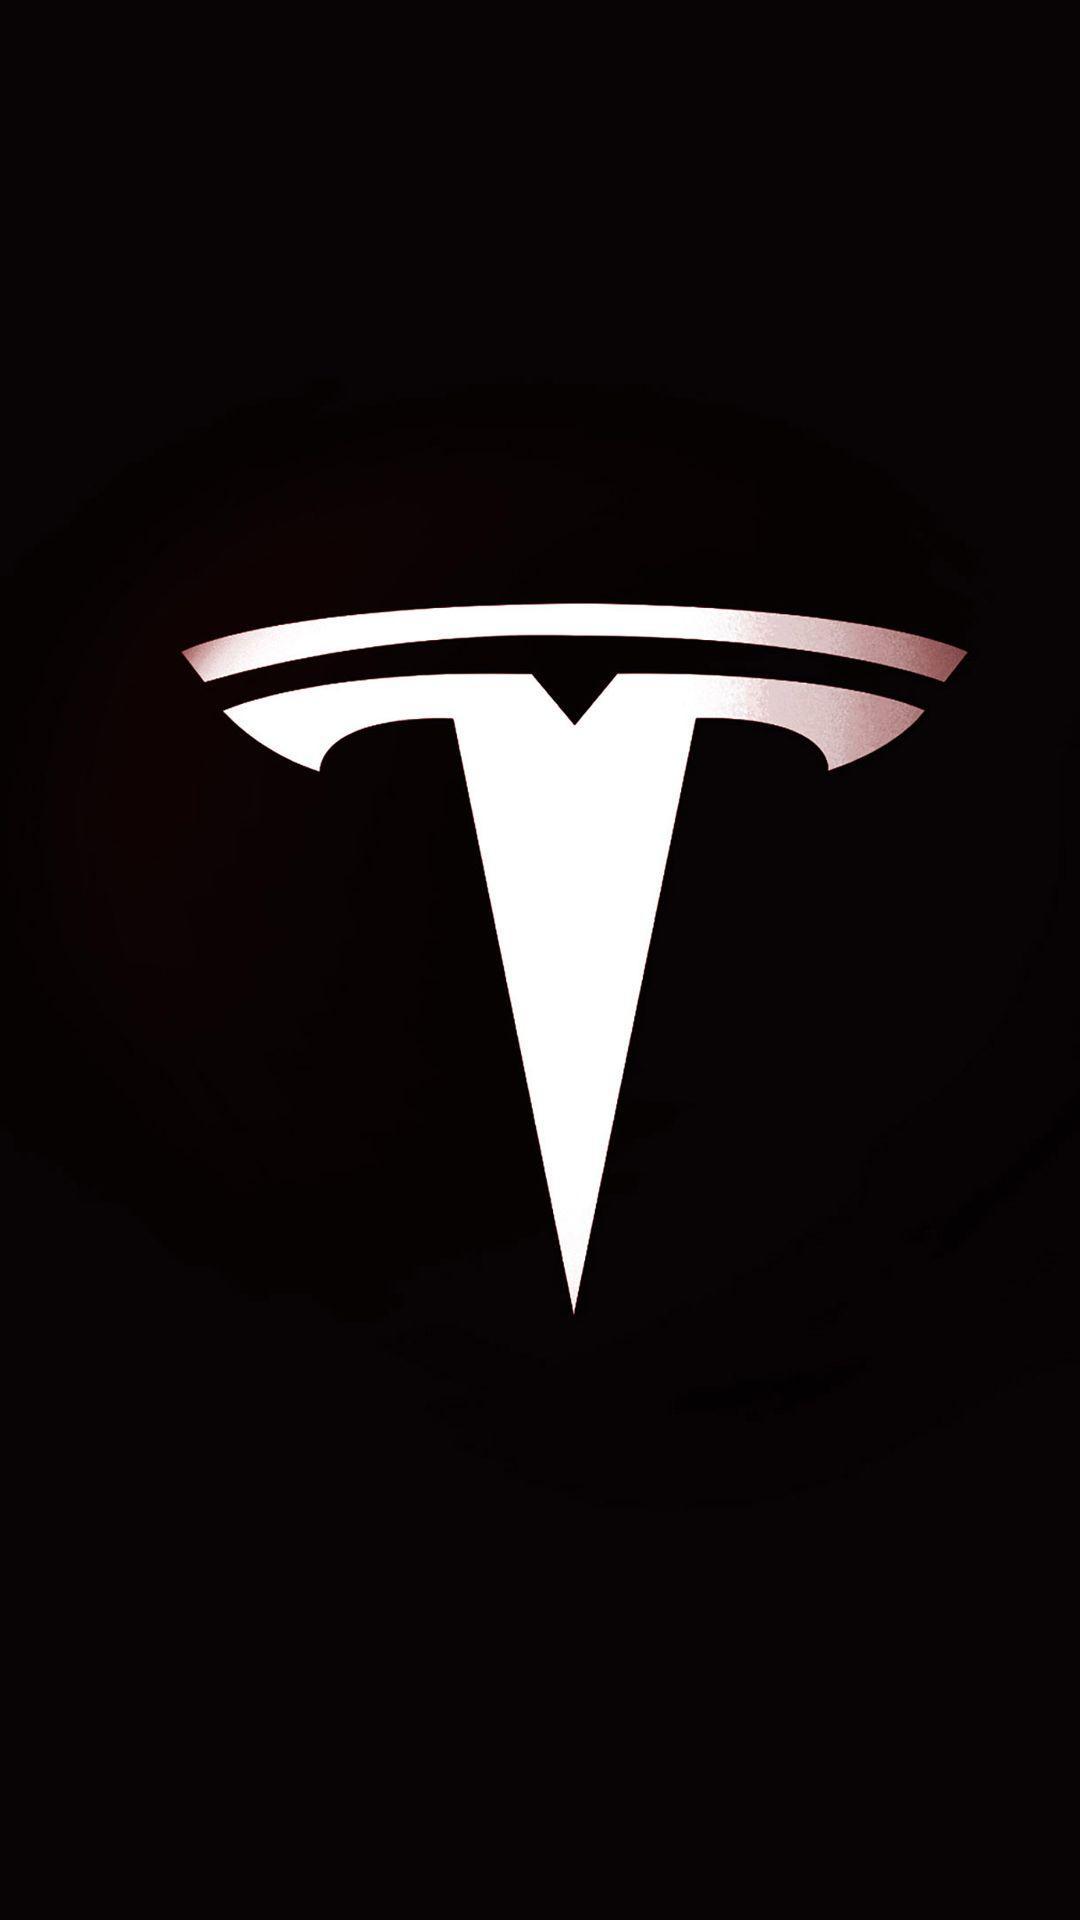 Tesla iPhone Wallpapers - Top Free Tesla iPhone ...